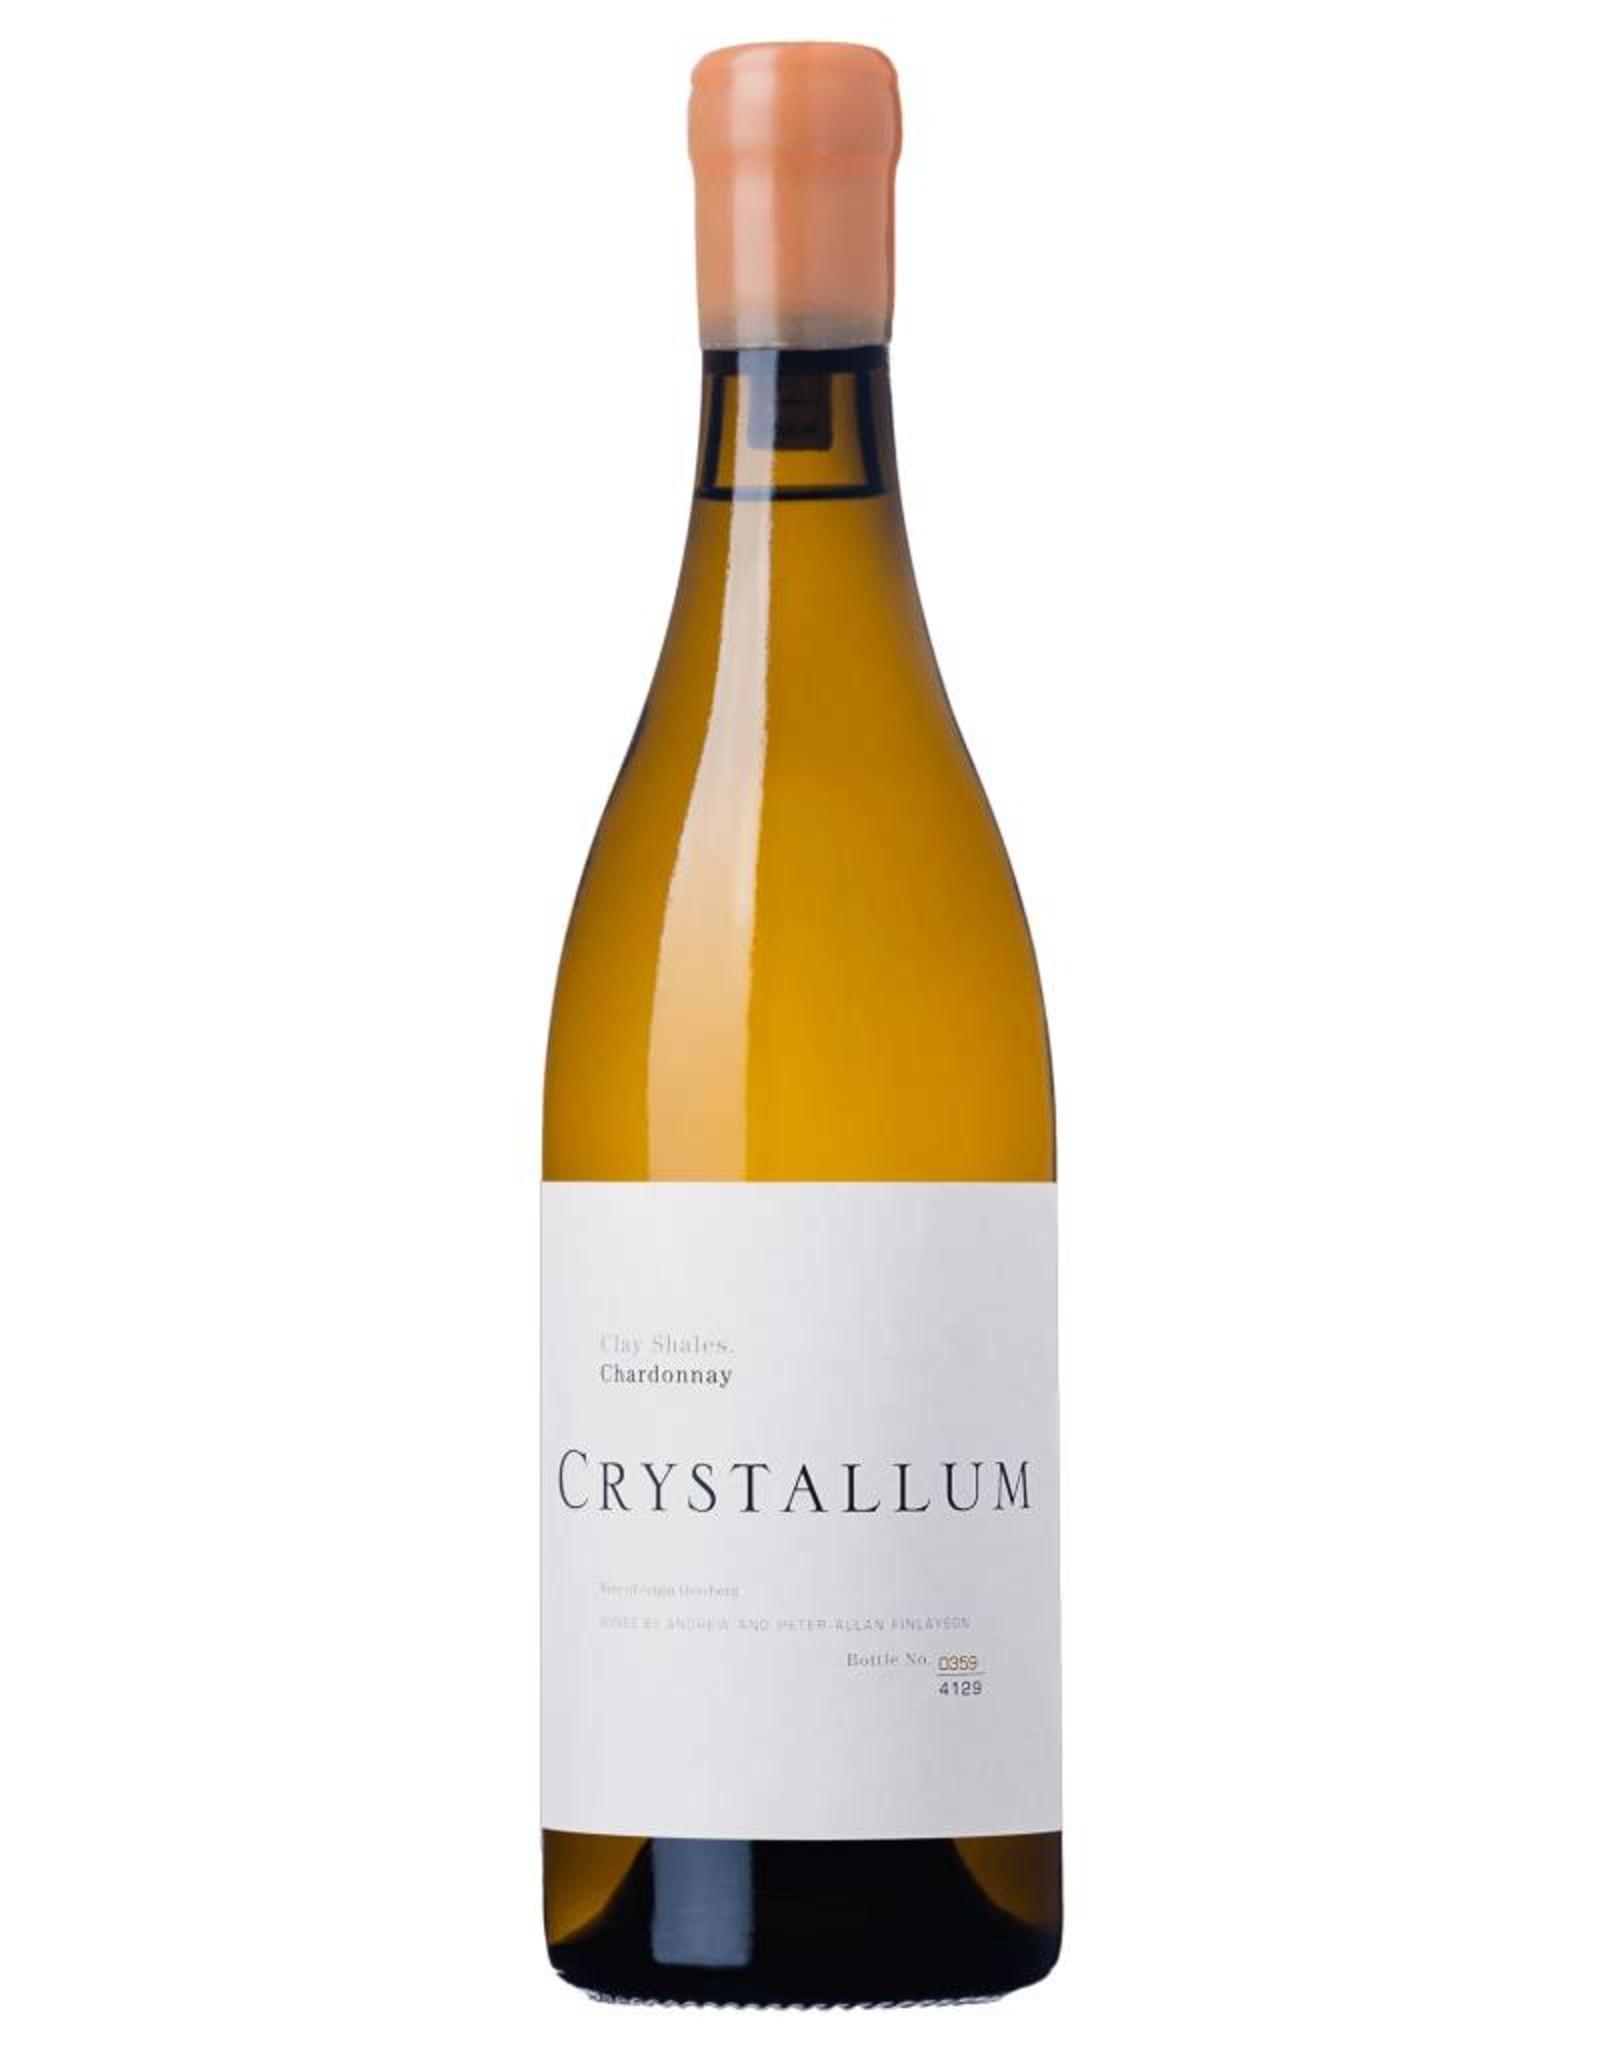 Crystallum - Clay Shales Chardonnay 2019